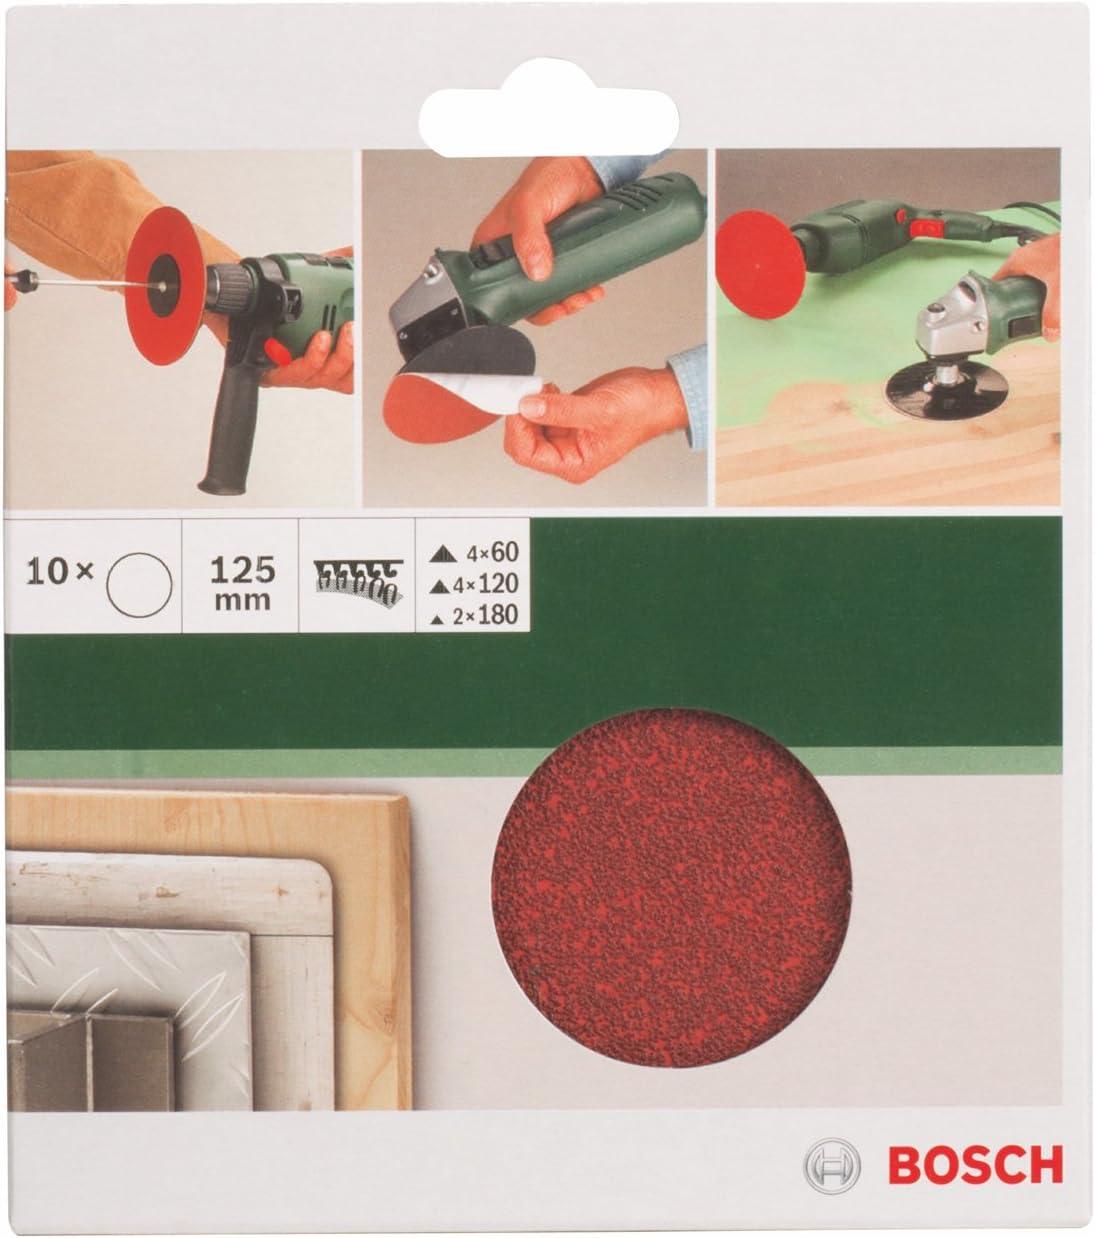 Bosch DIY 10tlg /Ø 125 mm, K/örnung 60//120//180 Papierschleifblatt-Set f/ür Winkelschleifer verschiedene Materialien